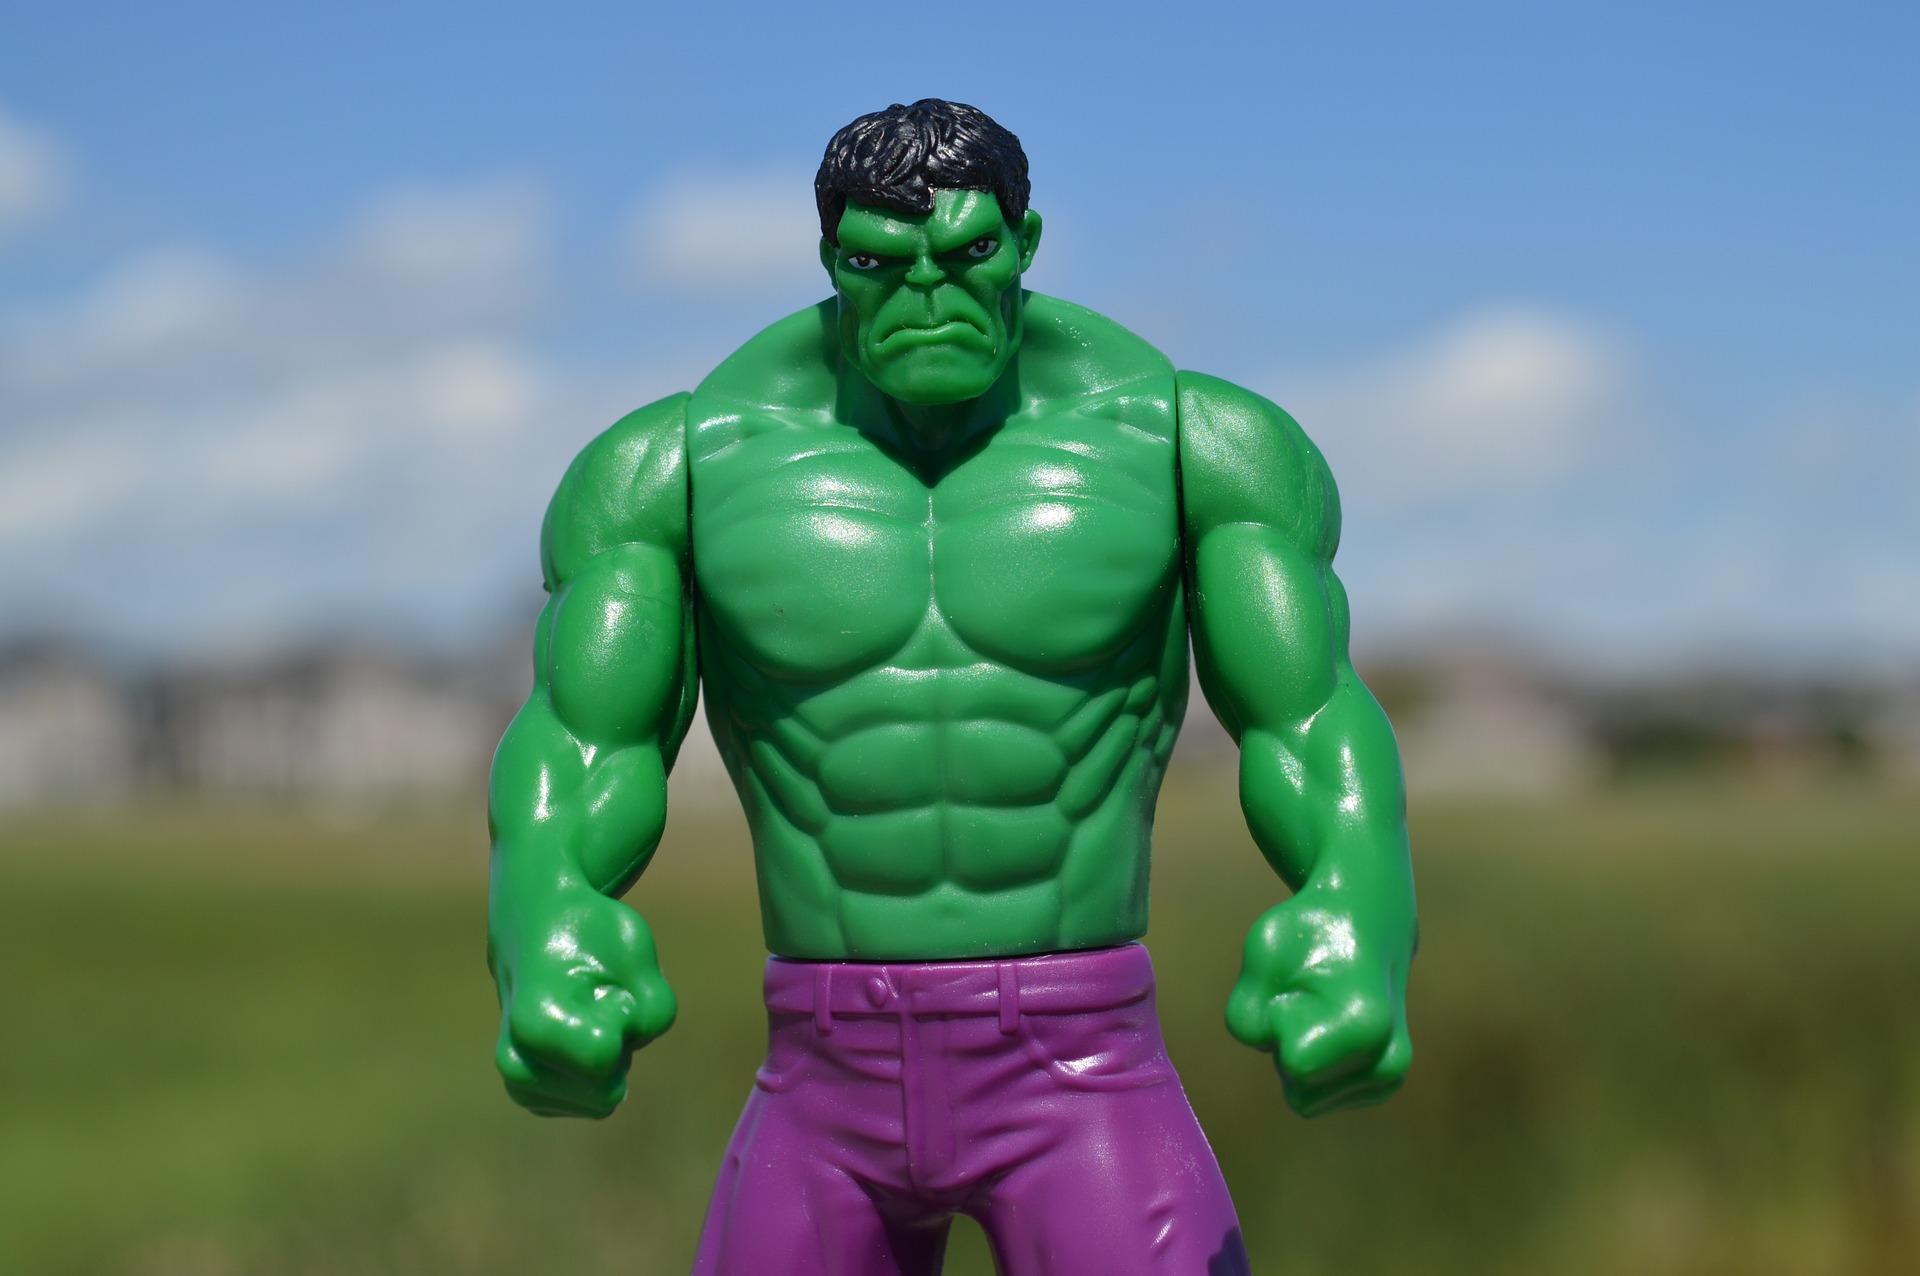 incredible-hulk-1527199_1920.jpg